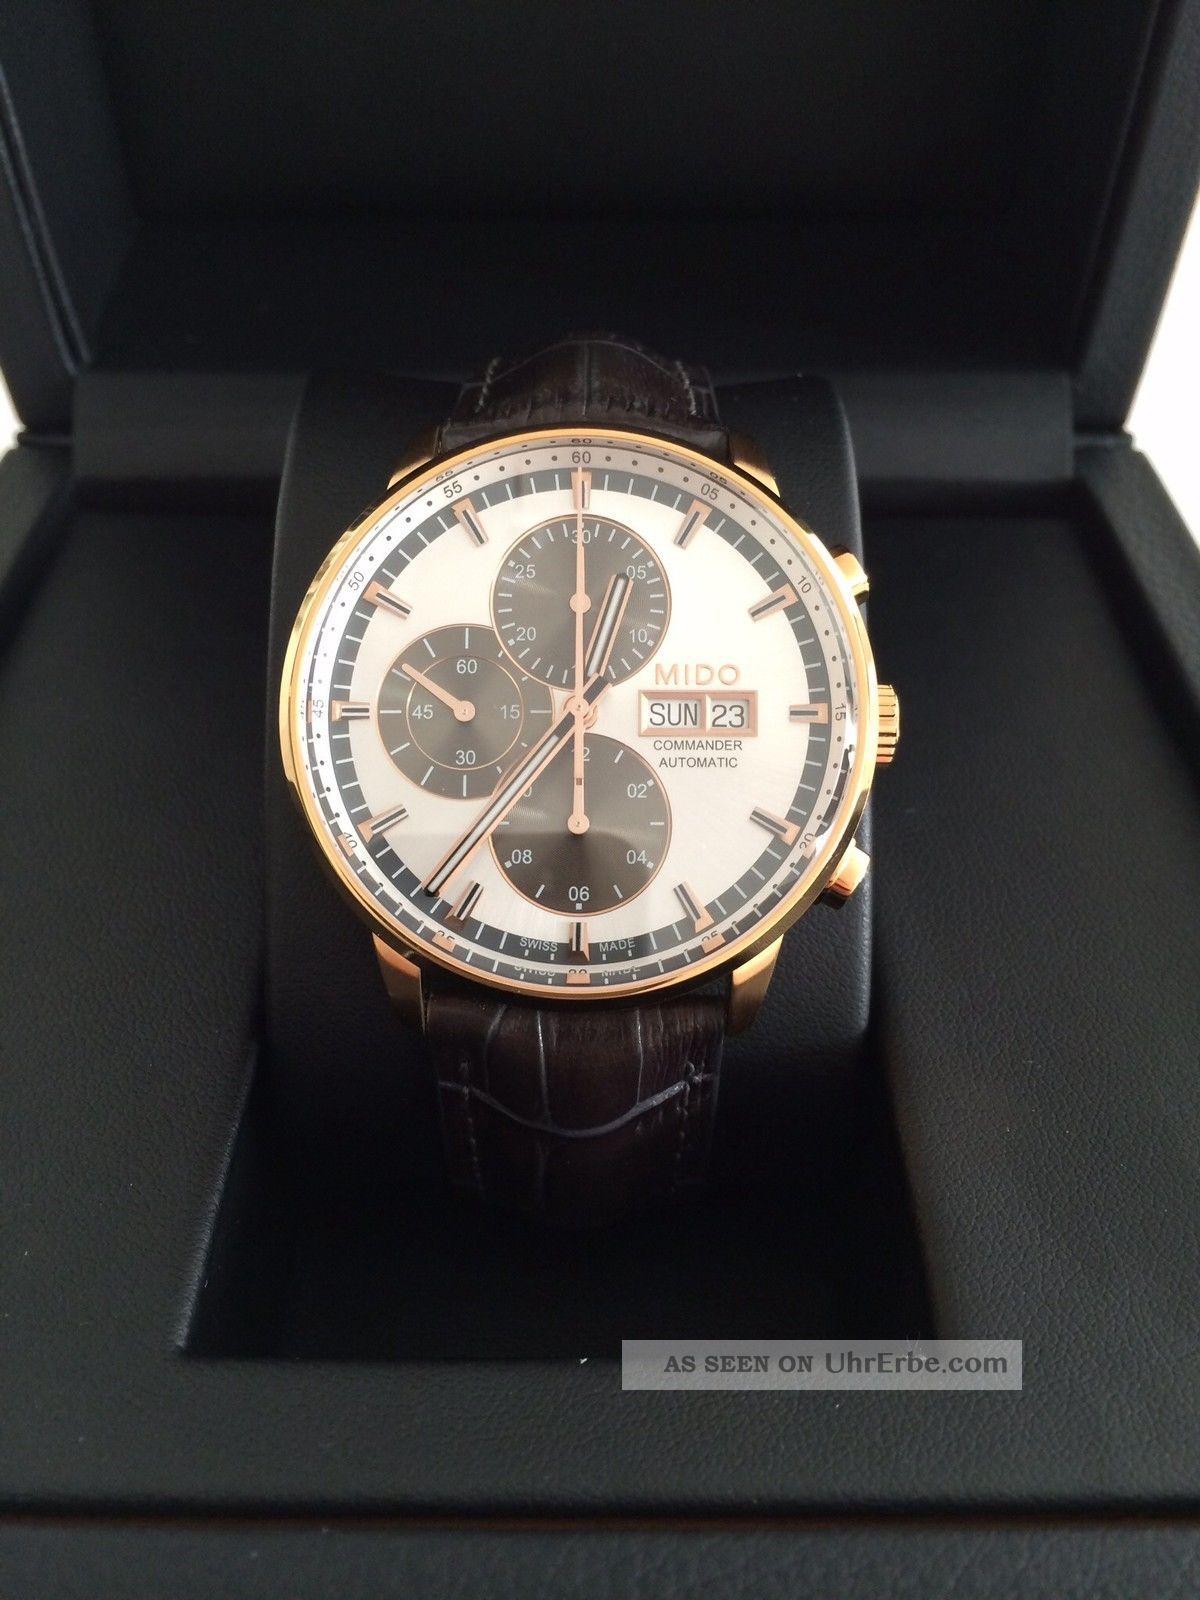 Mido Commander Ii Chronograph Rose Gold Pvd Mit Lederband Armbanduhren Bild